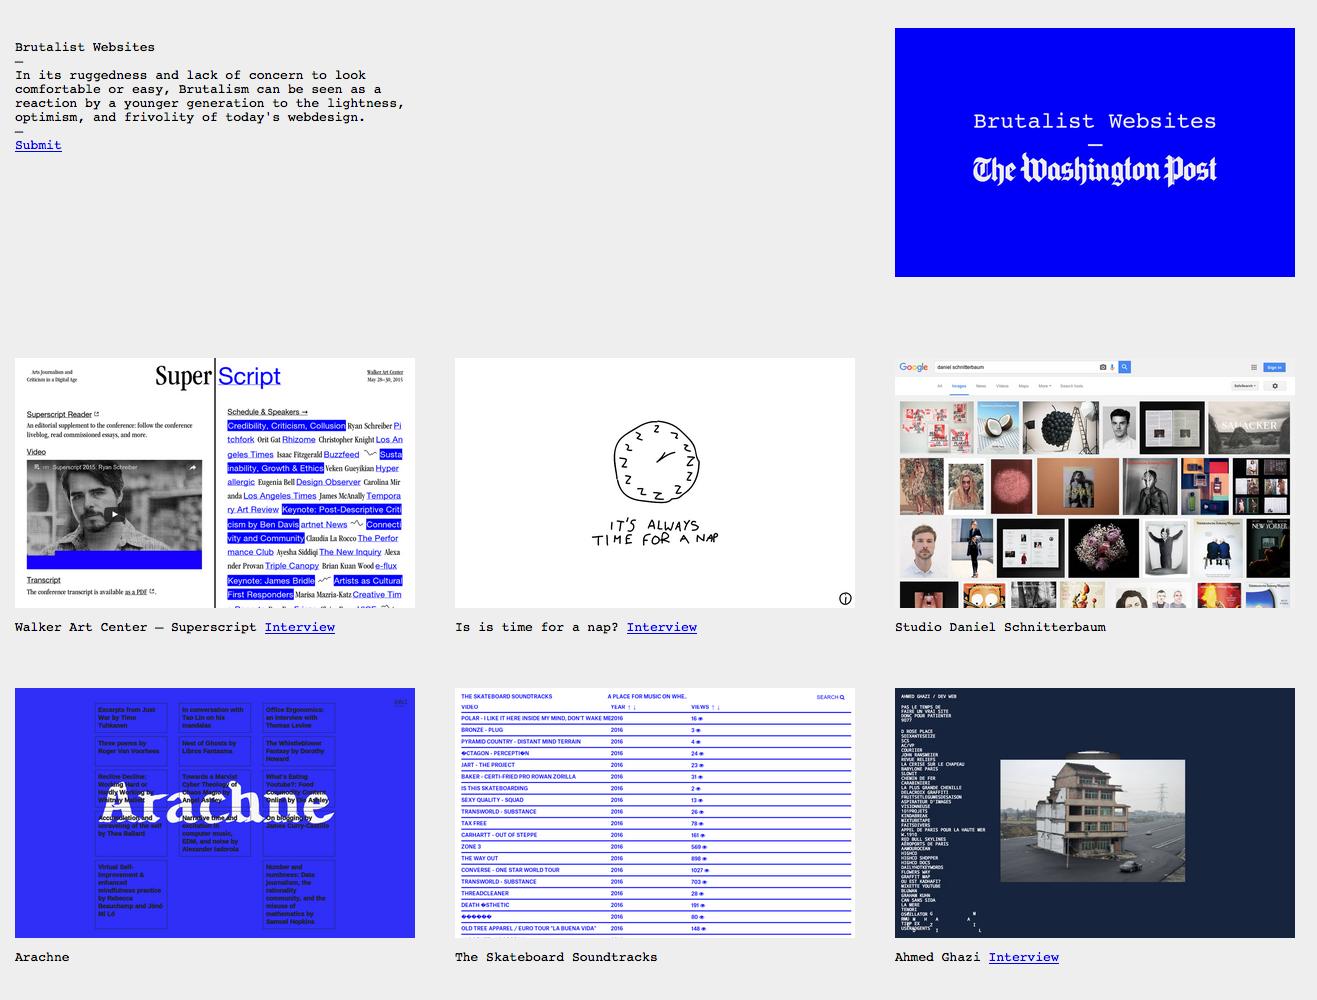 Screenshot http://brutalistwebsites.com/